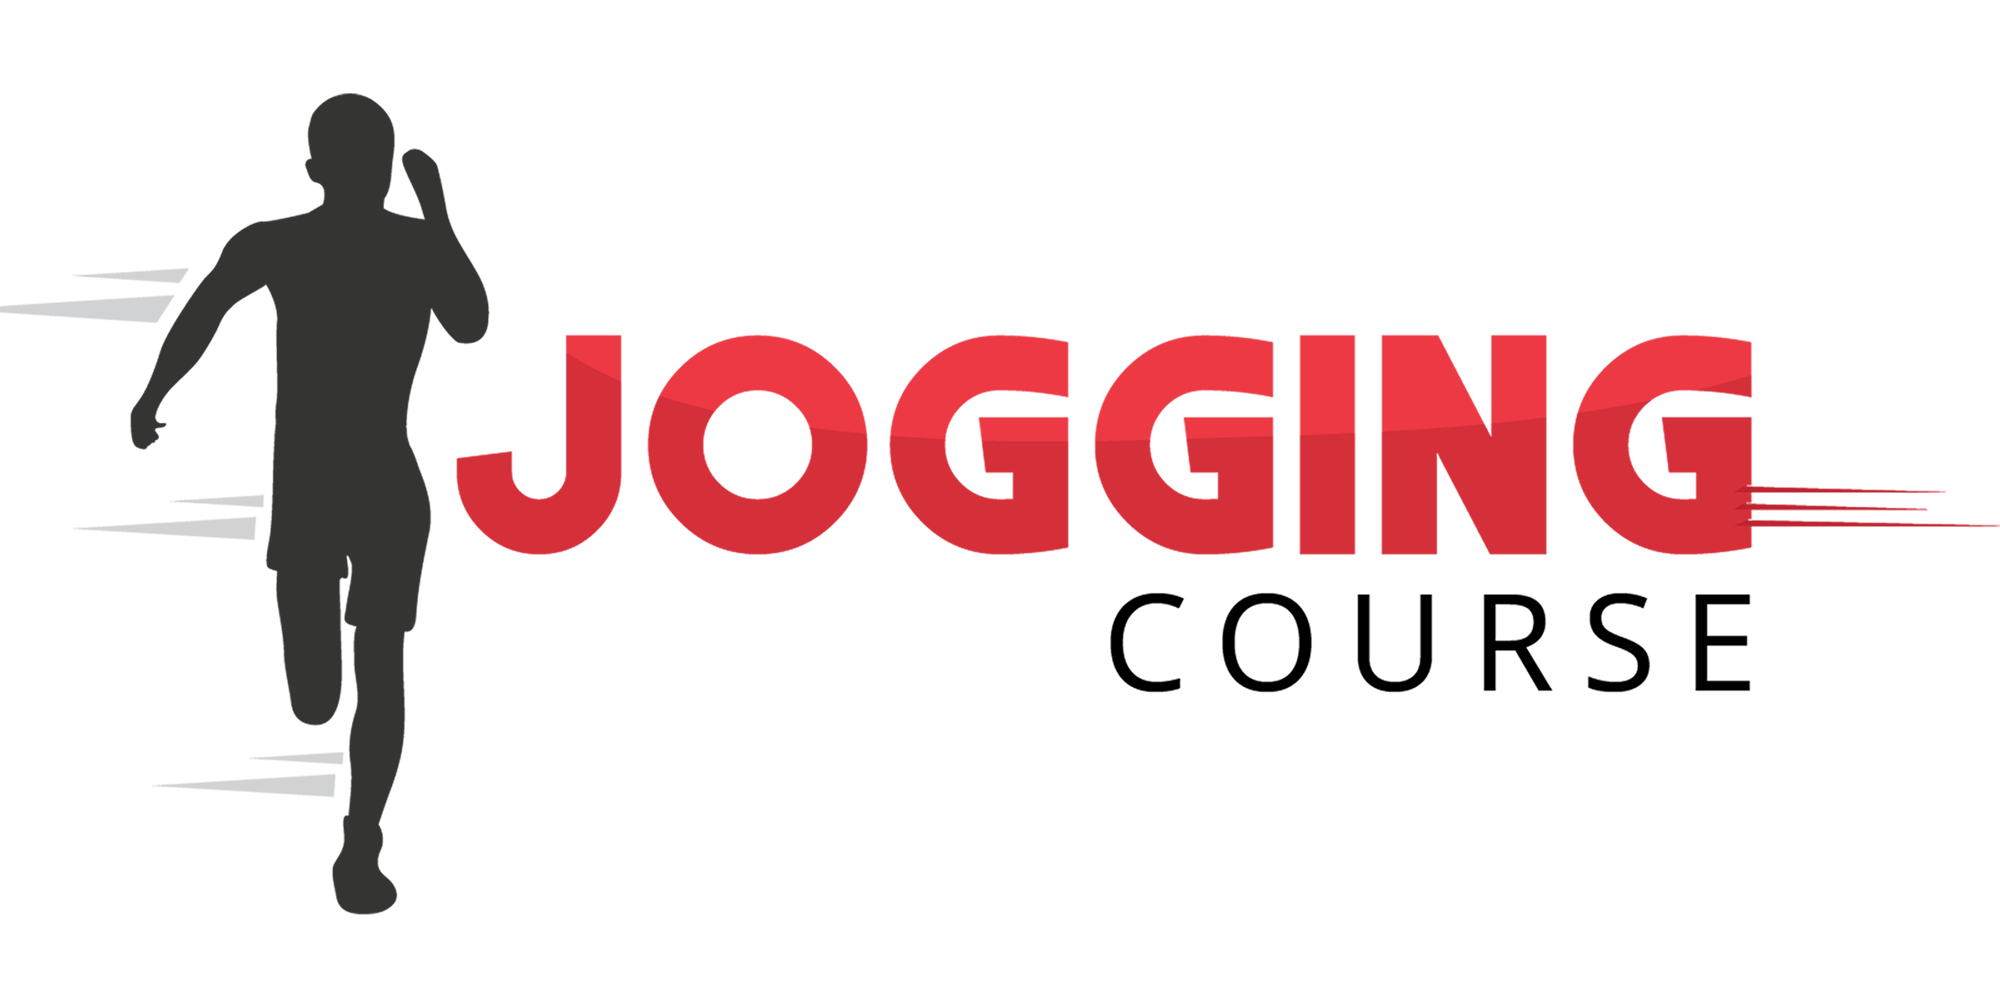 Jogging course